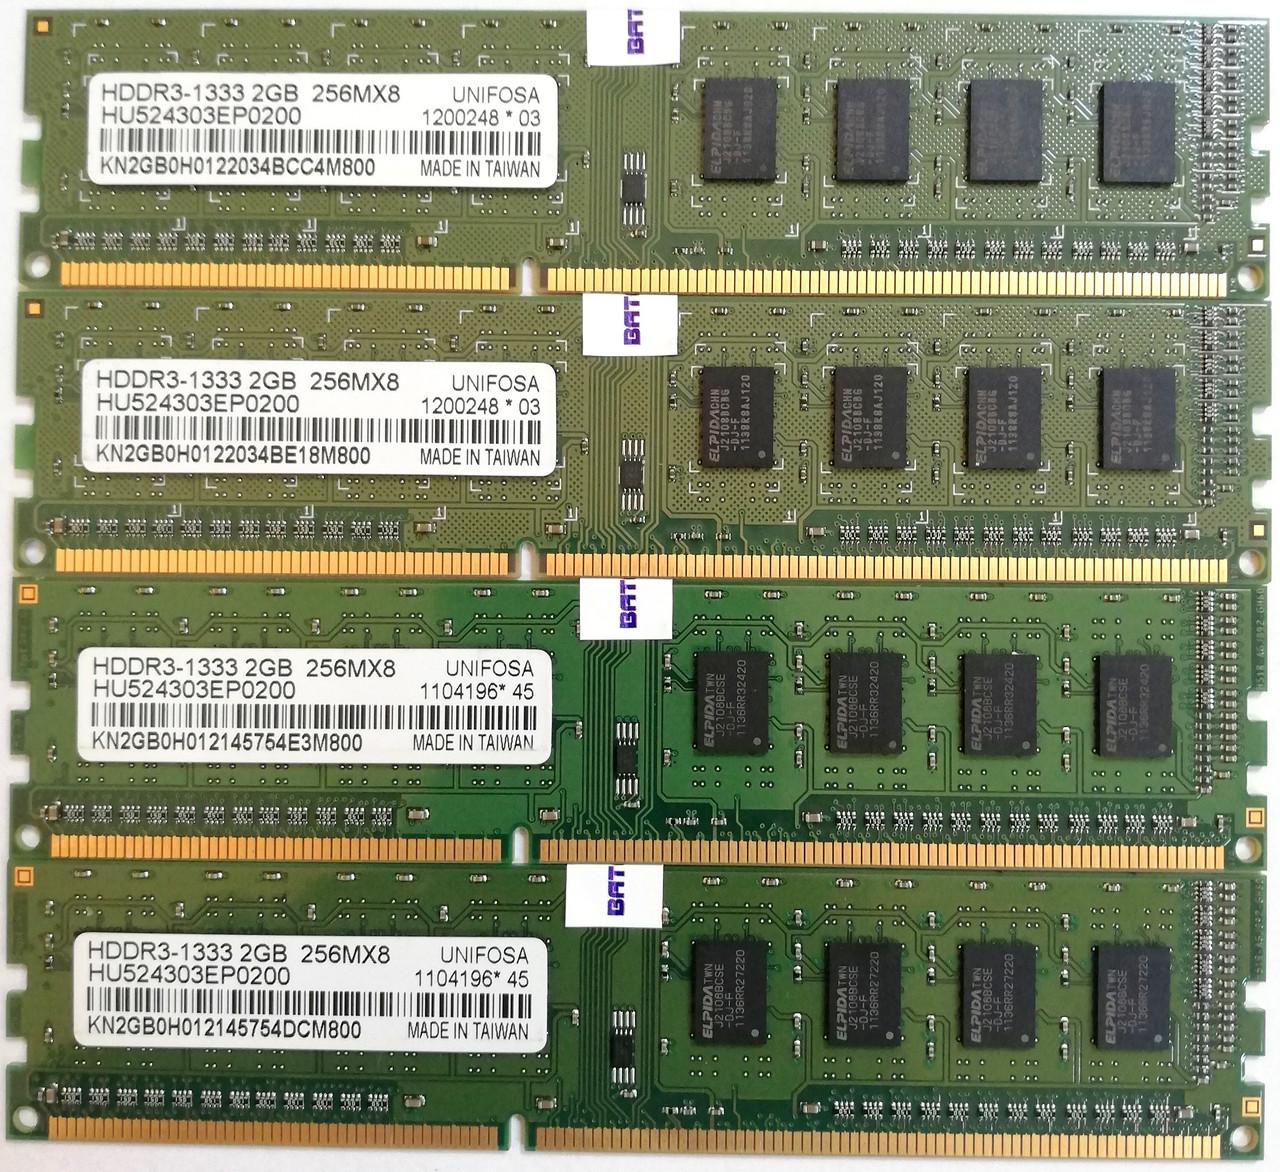 Комплект оперативной памяти Unifosa DDR3 8Gb (4*2Gb) 1333MHz PC3 10600U CL9 (HU524303EP0200) Б/У